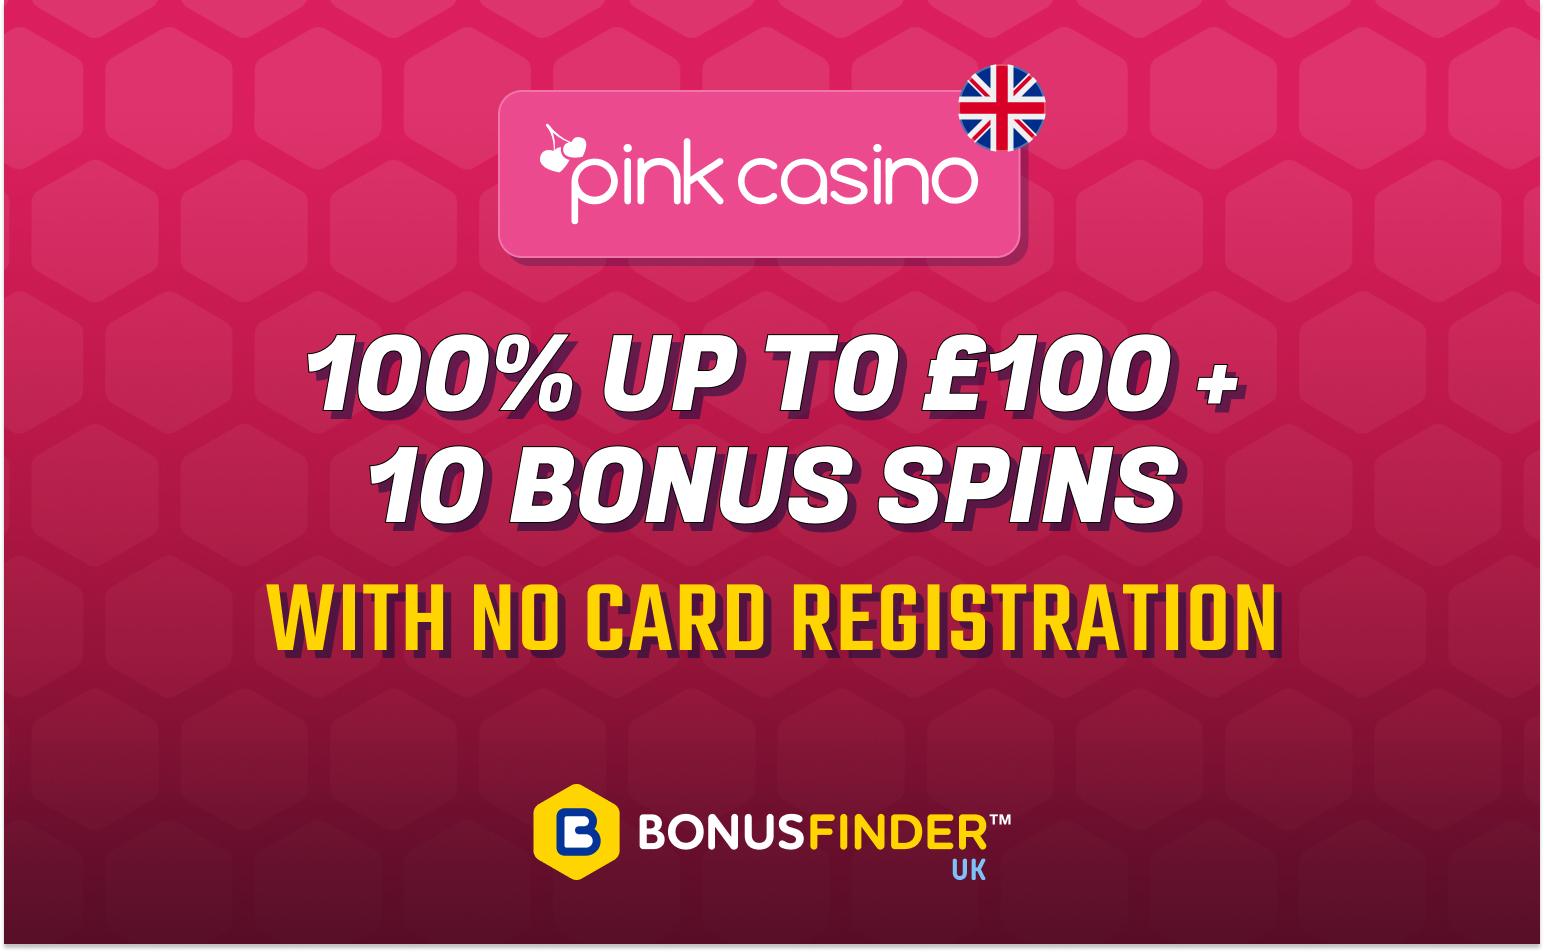 no card registration bonus on first deposit